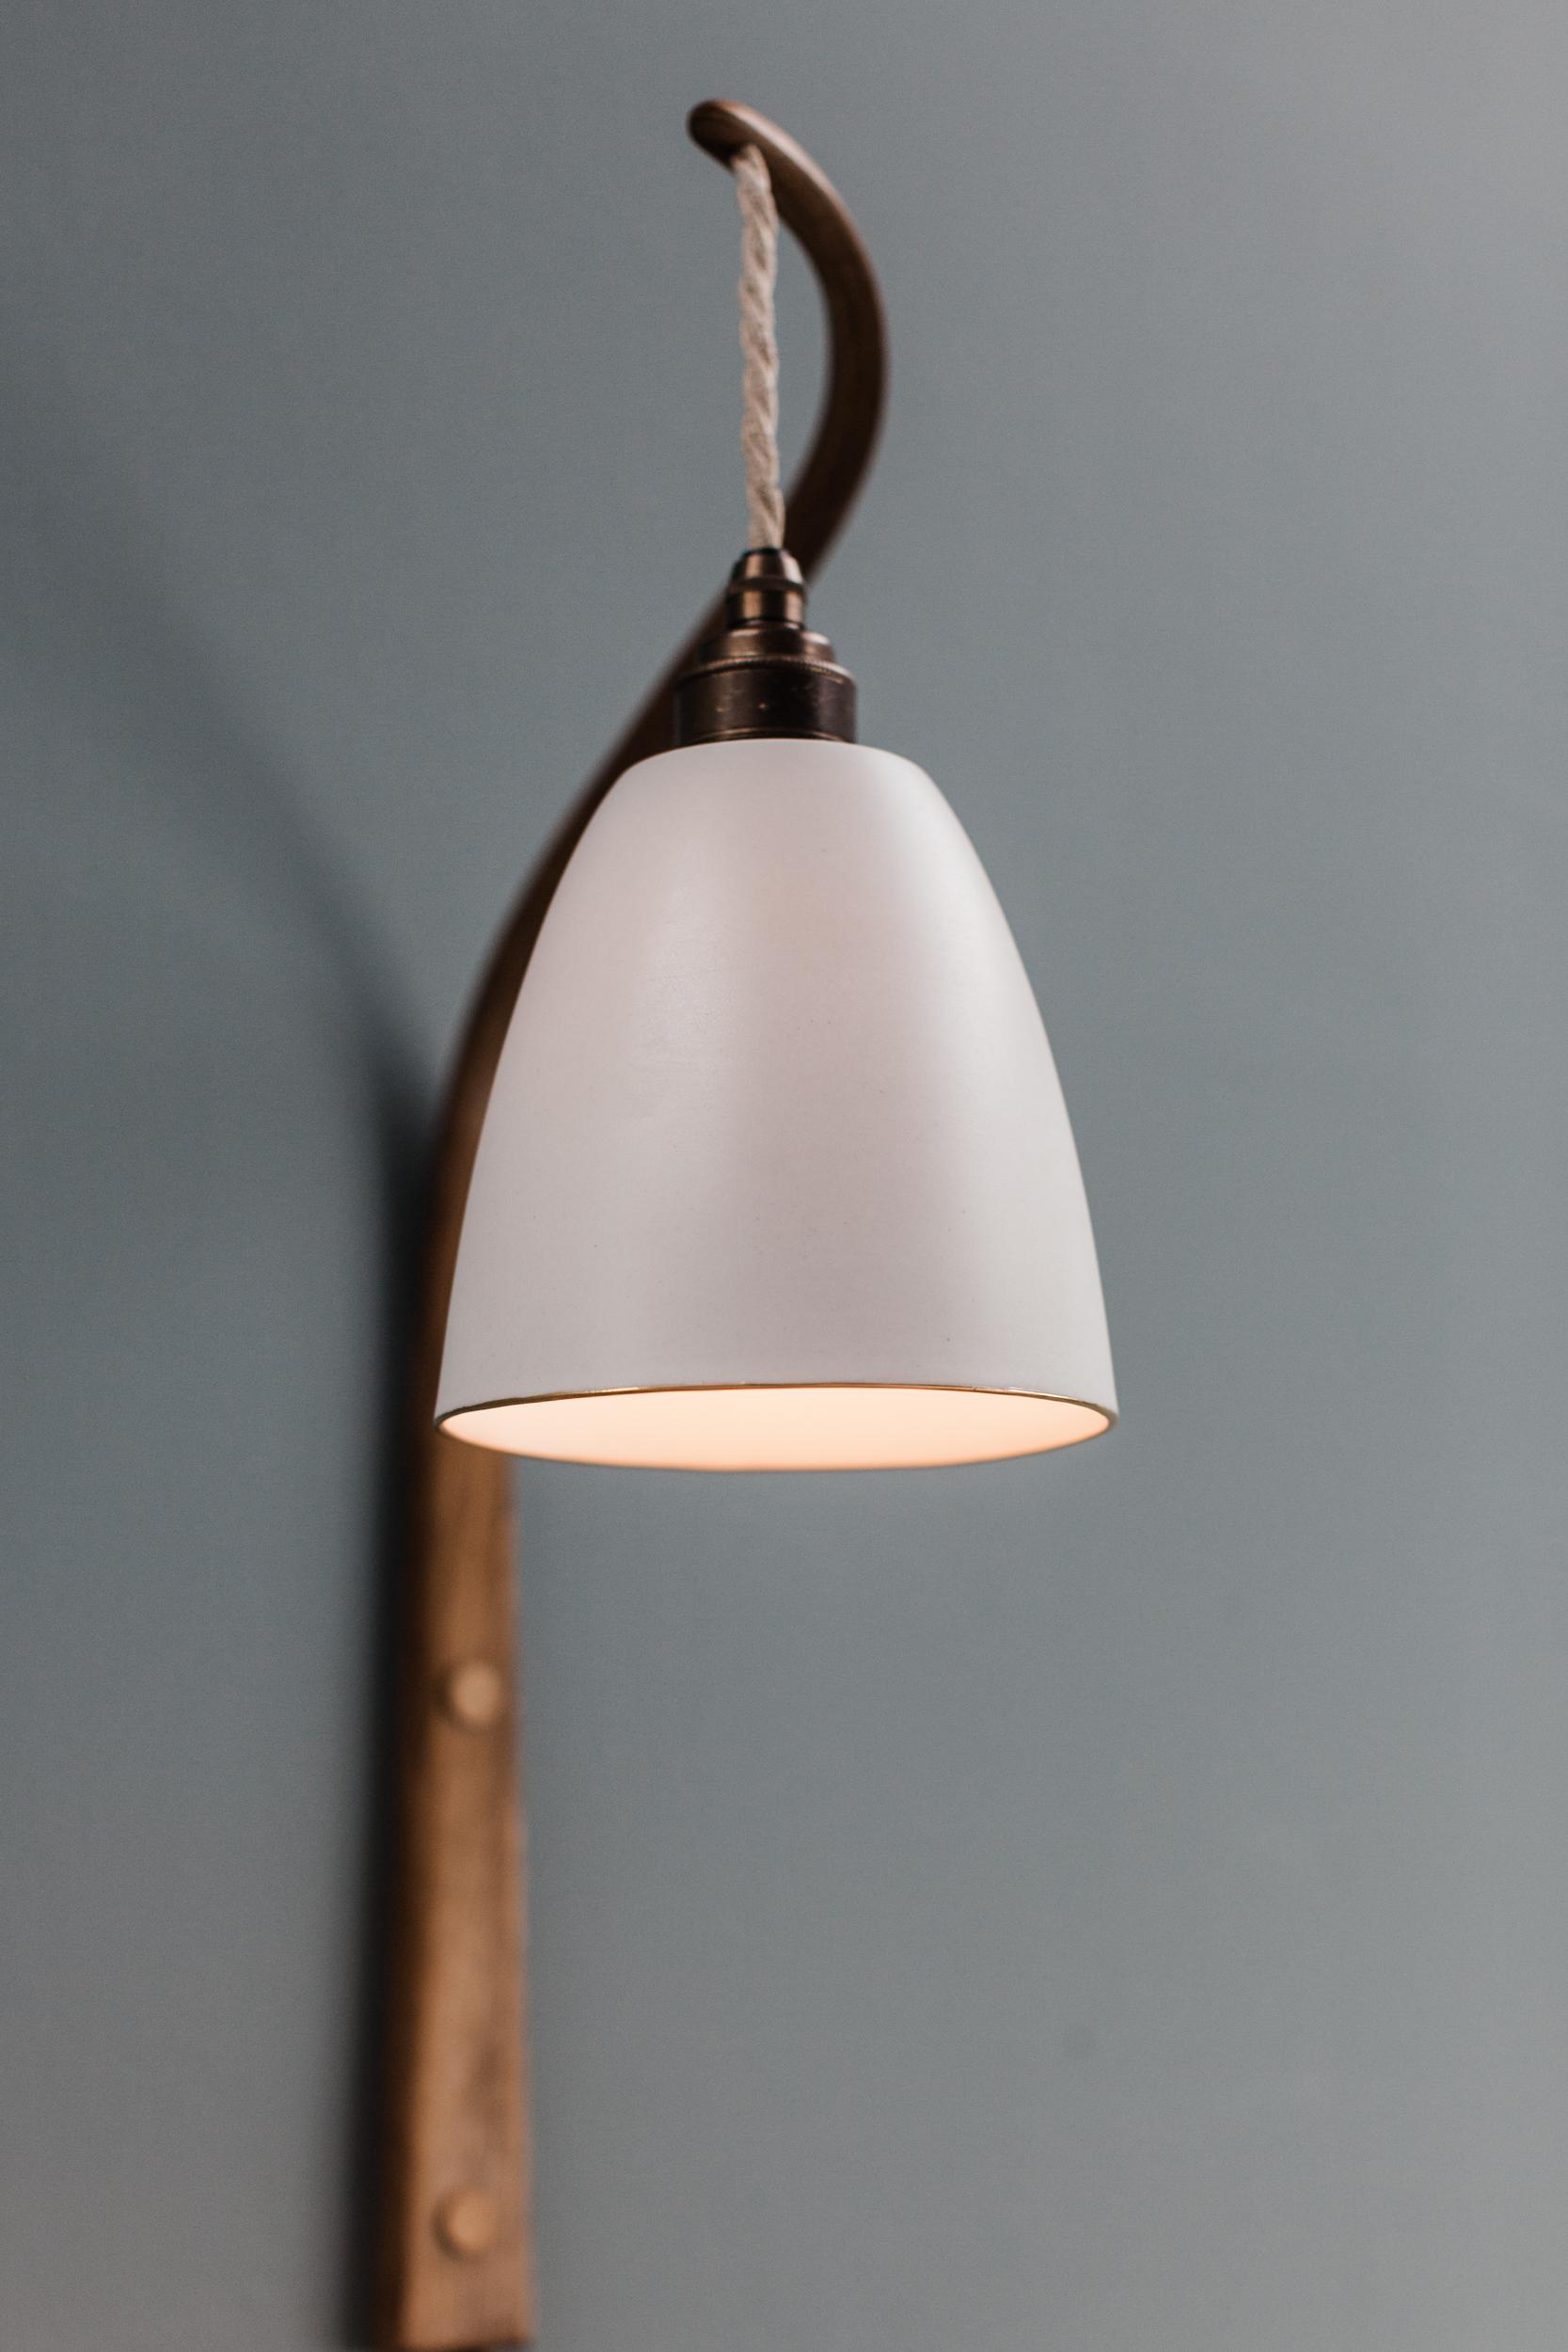 small wall light-4-6WEB SIZE.jpg